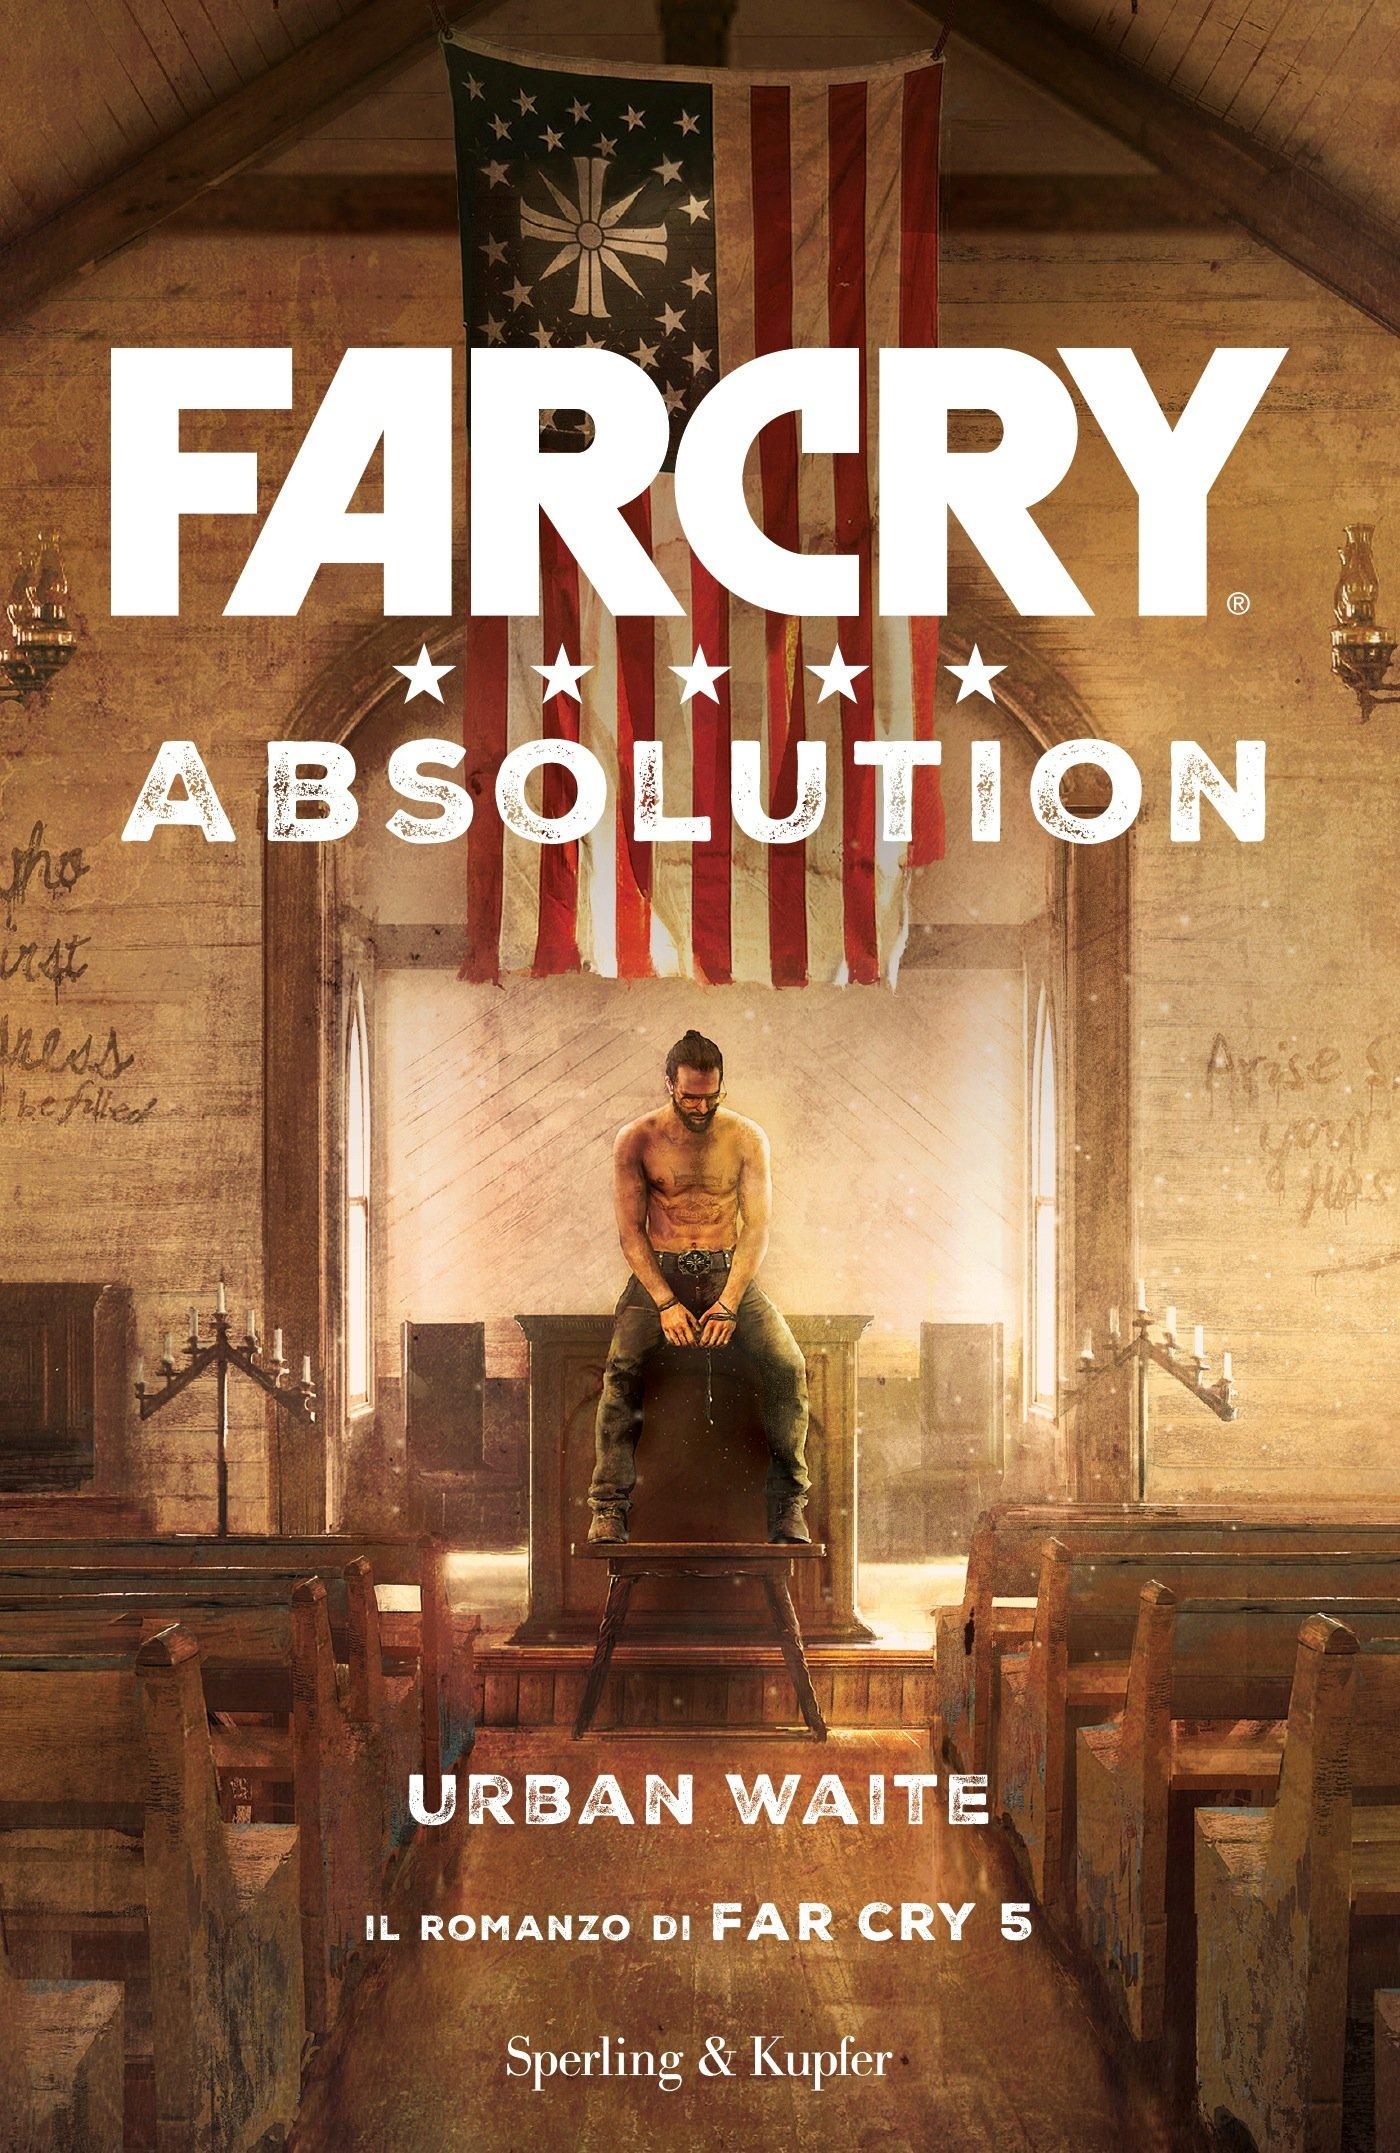 Farcry Absolution Waite Urban 9788820064747 Amazon Com Books